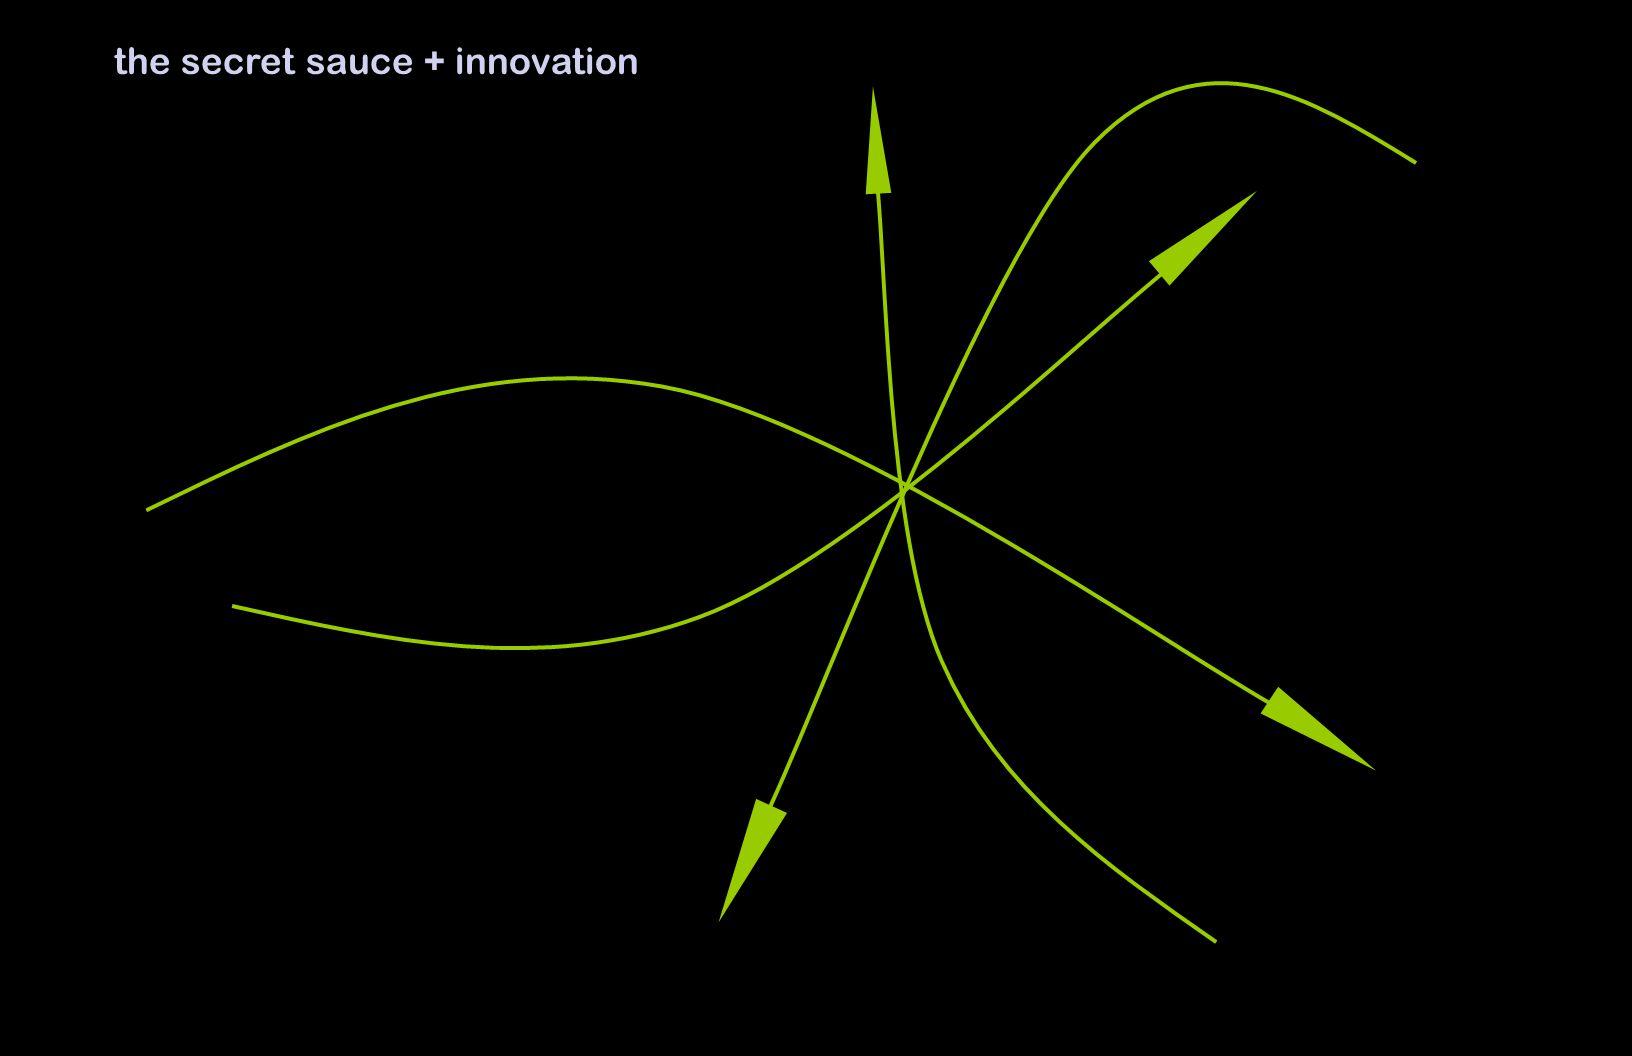 the secret sauce + innovation